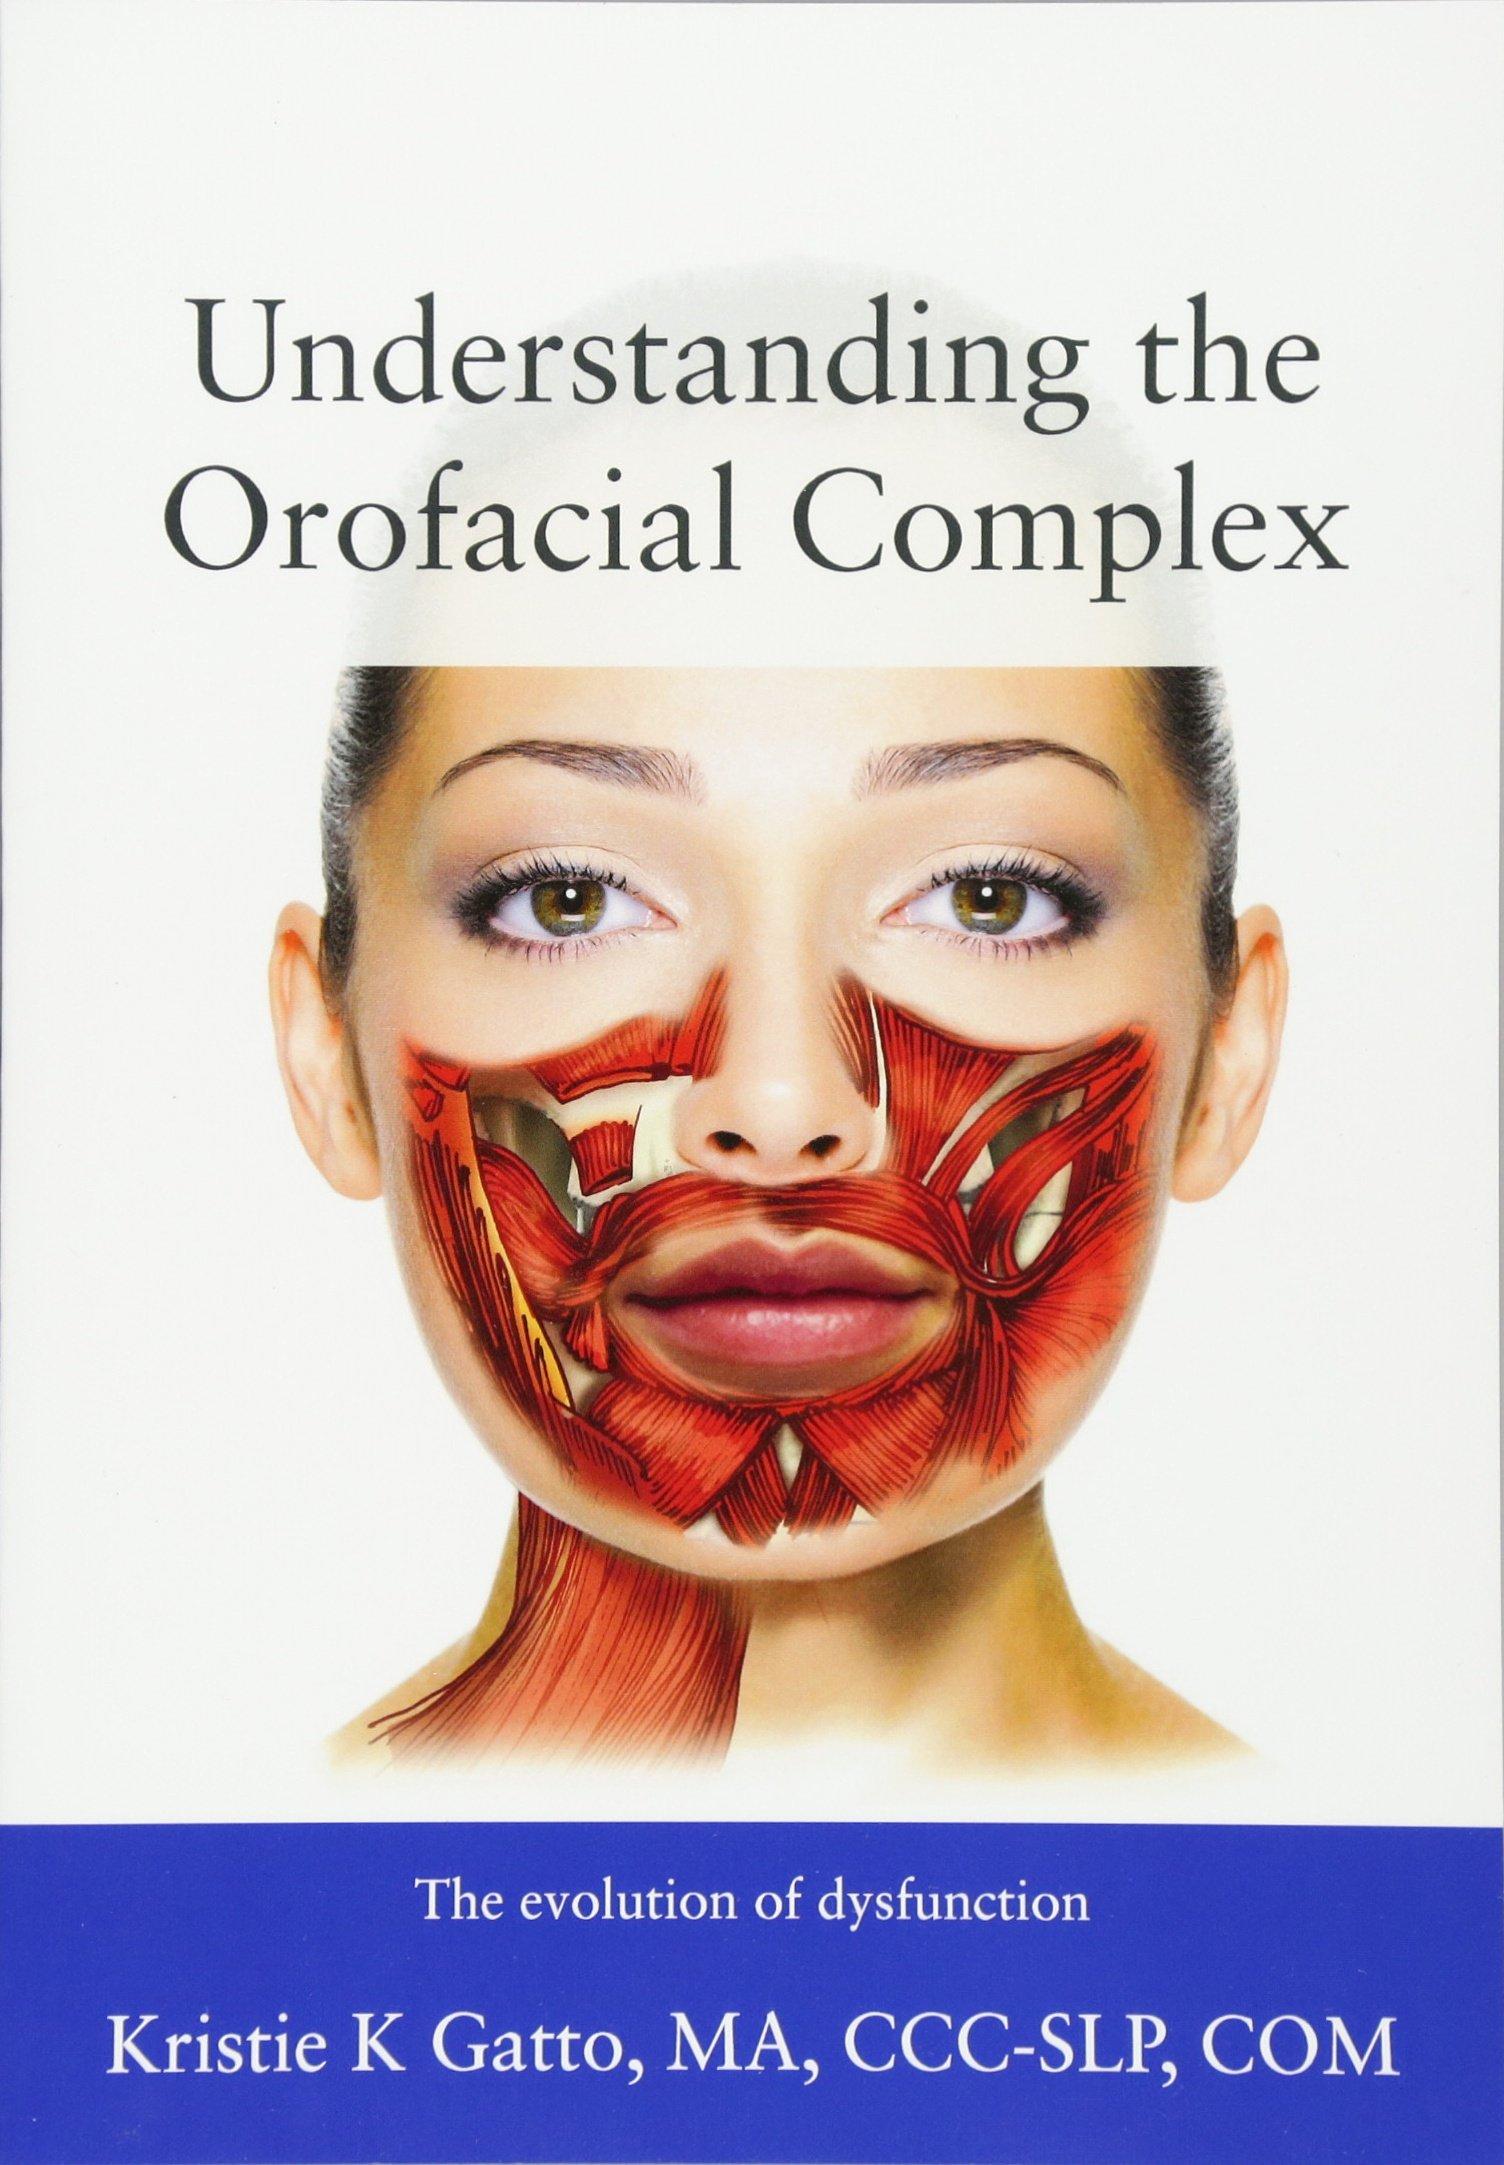 Understanding the Orofacial Complex: The Evolution of Dysfunction: Kristie  Gatto MA CCC-SLP COM: 9781478774426: Amazon.com: Books